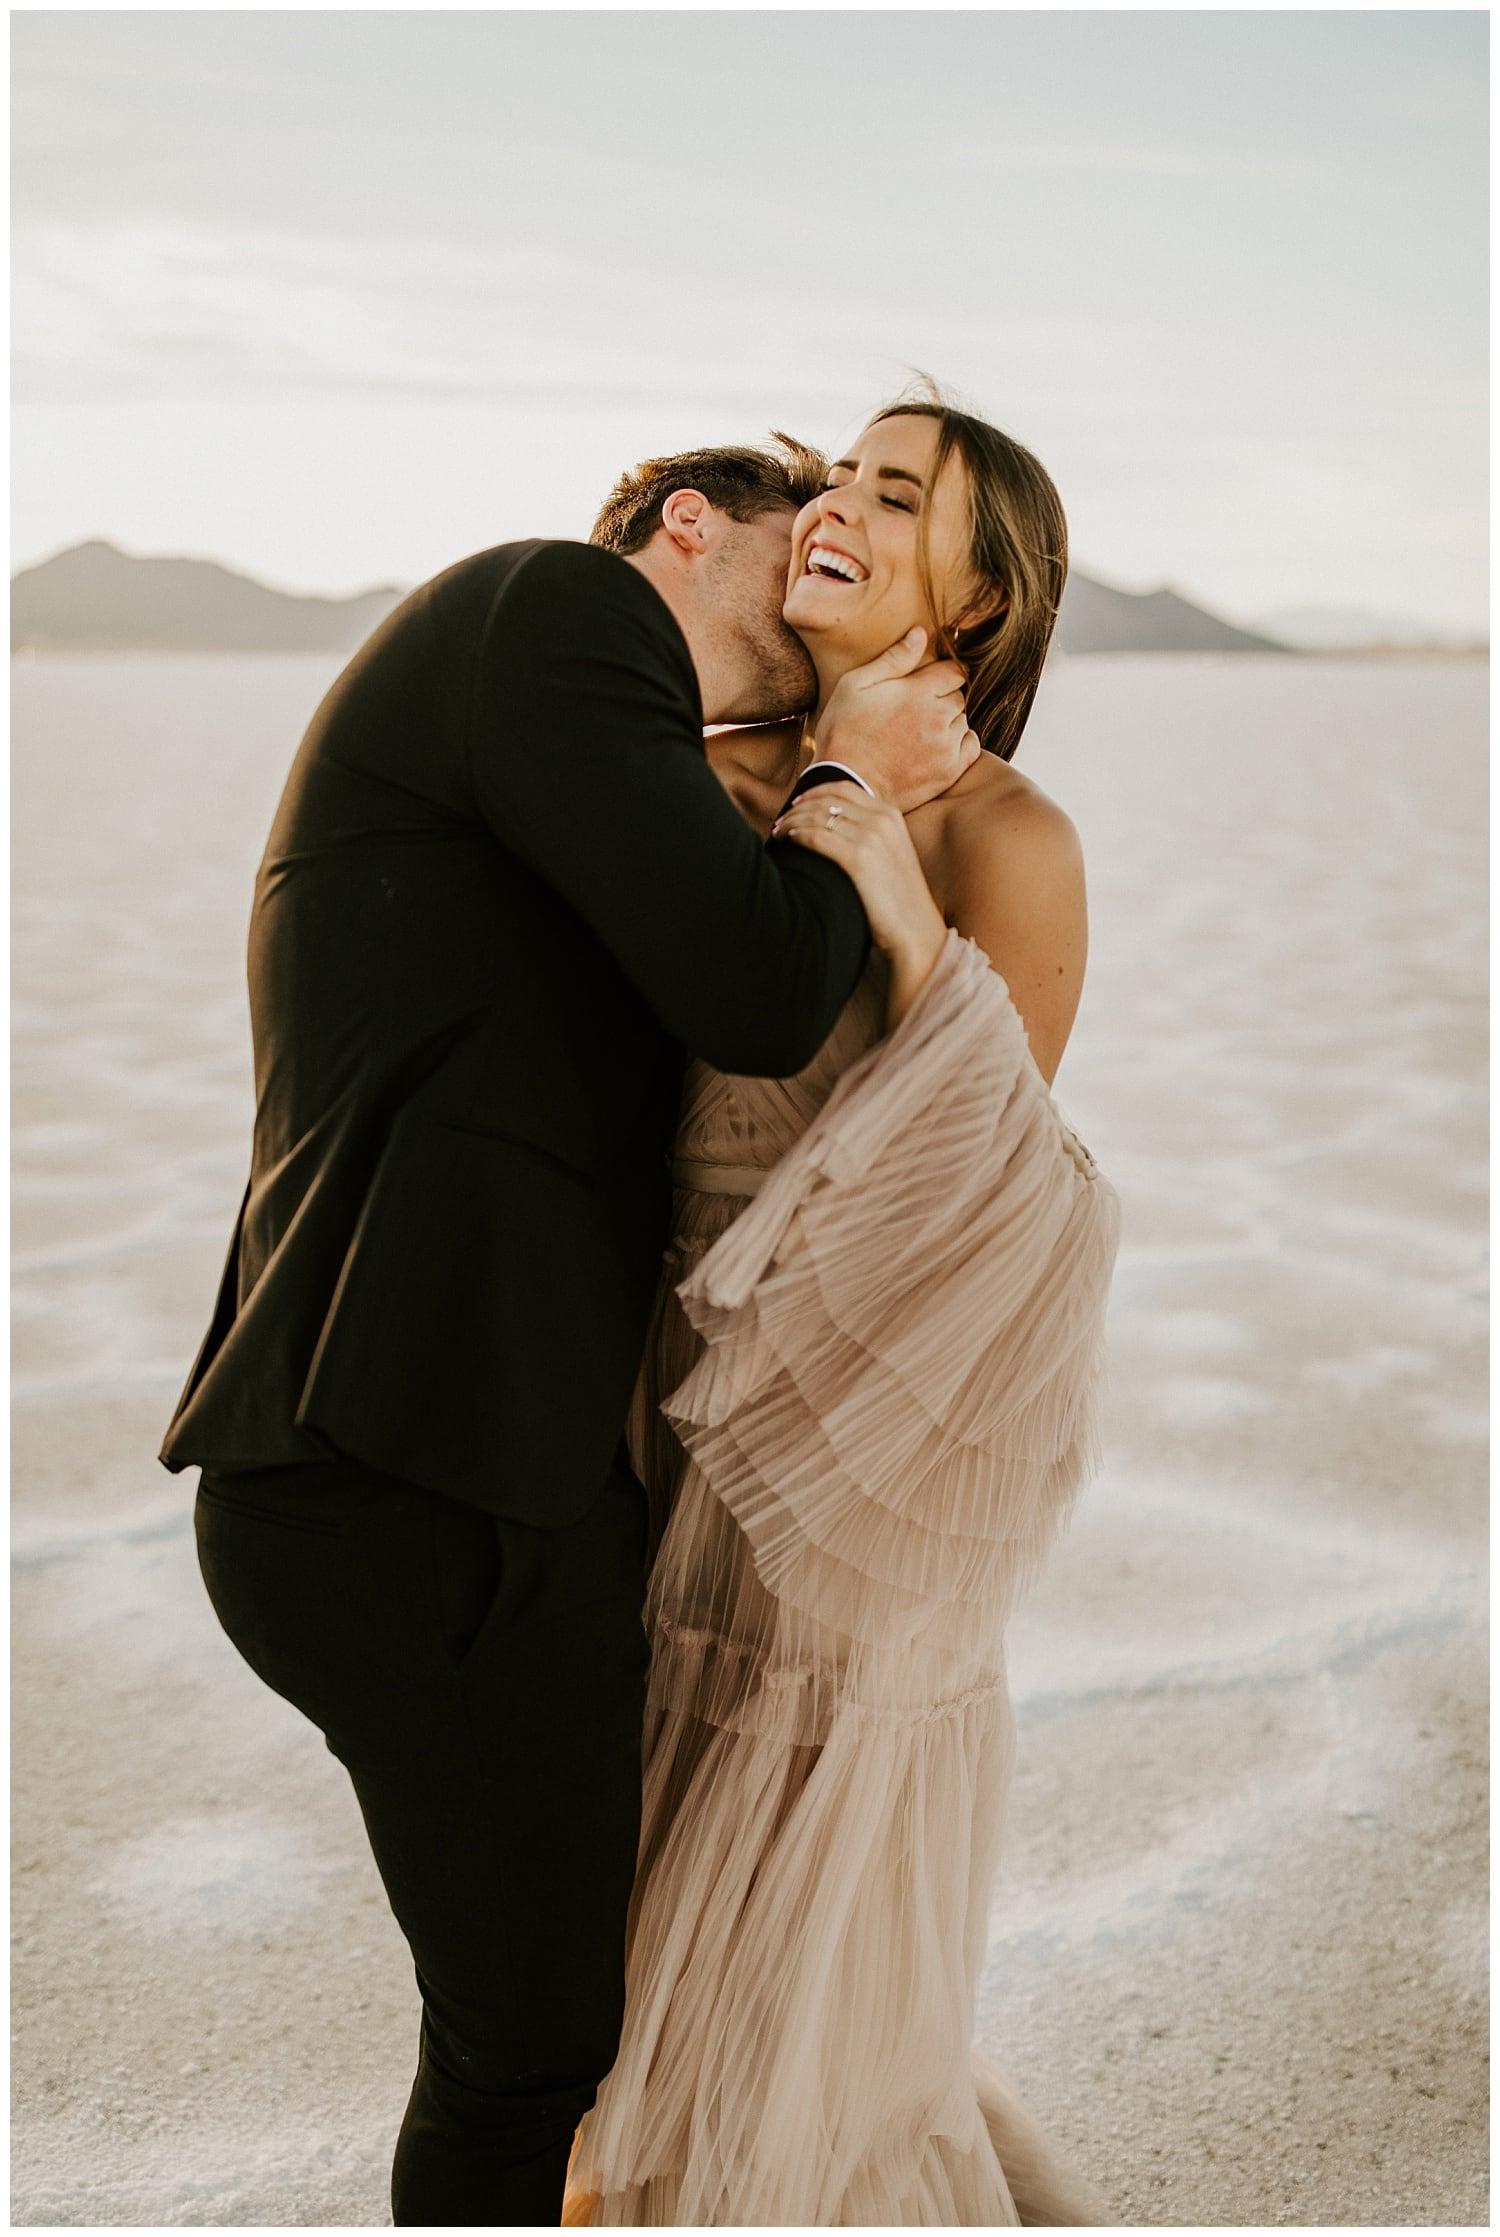 bonneville salt flats elopement, utah wedding photographer, photographers in salt lake city